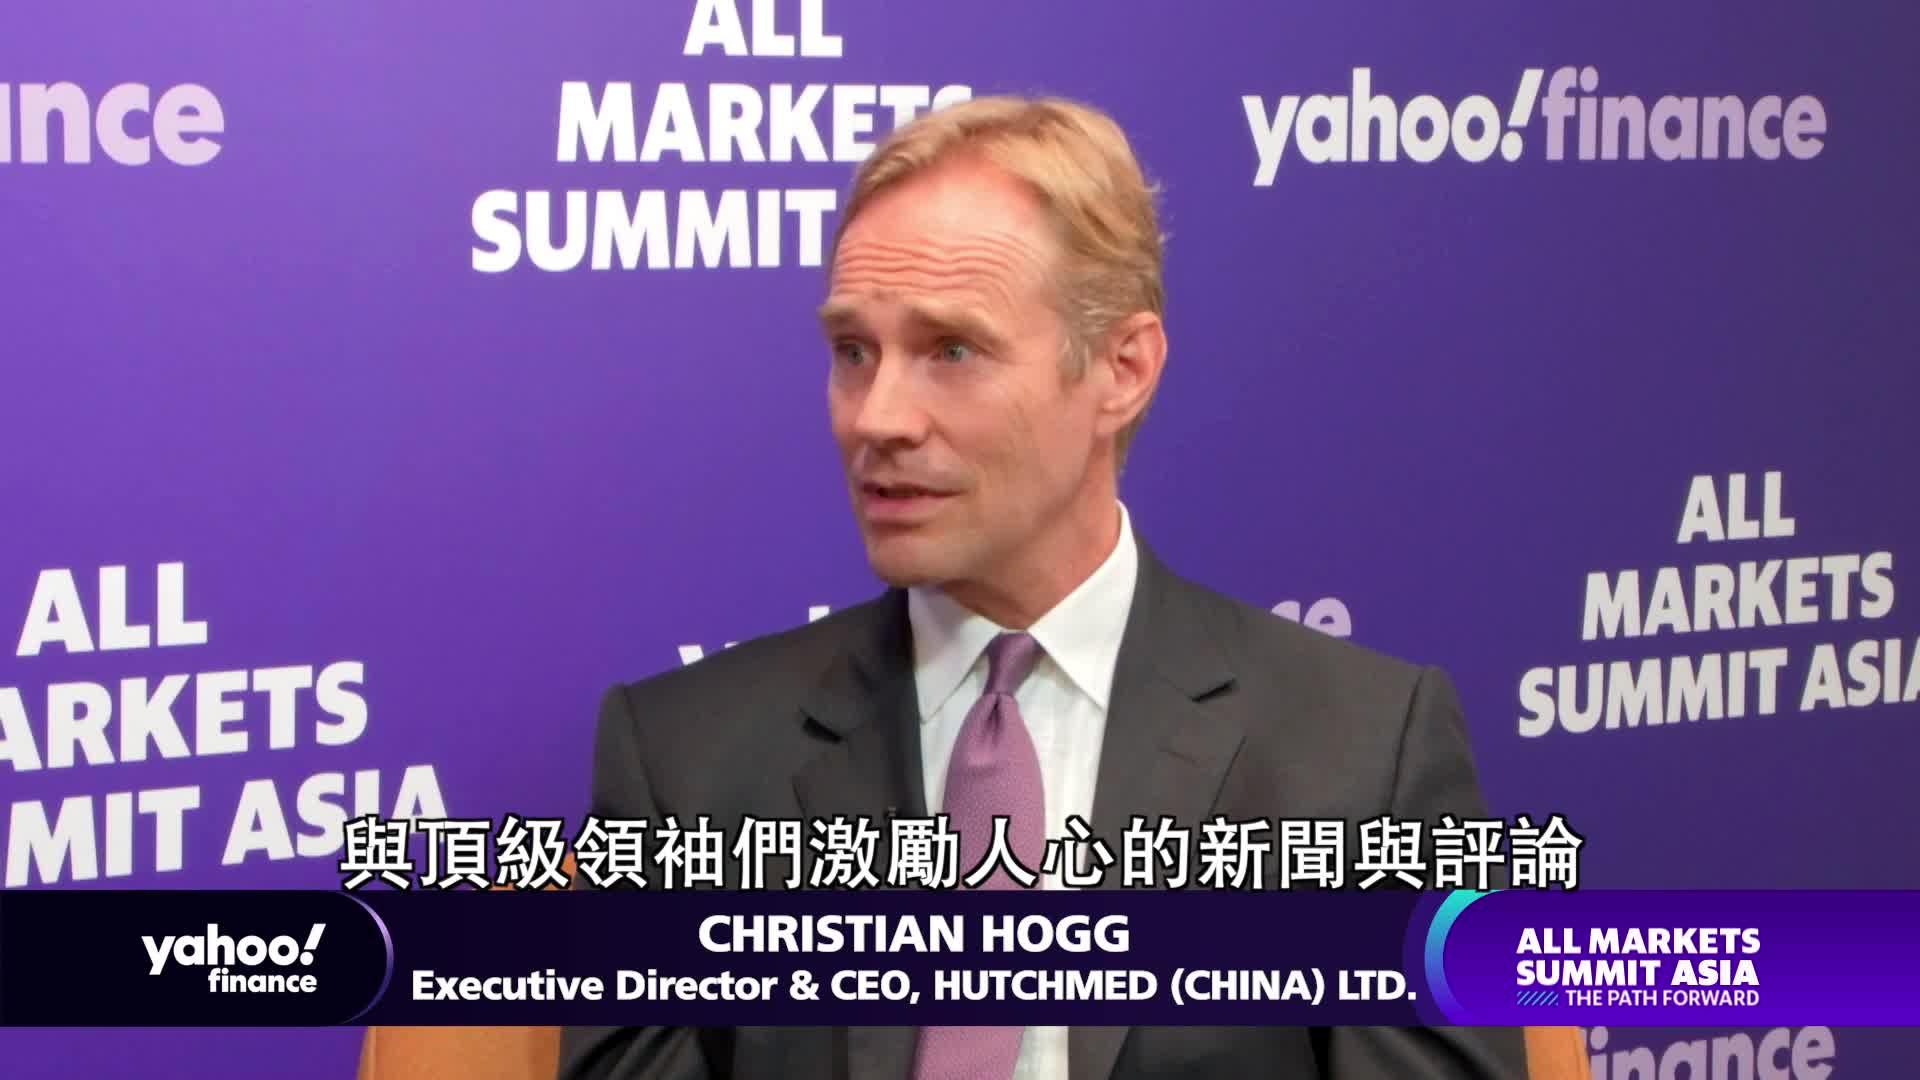 Yahoo Finance All Market Summit Teaser